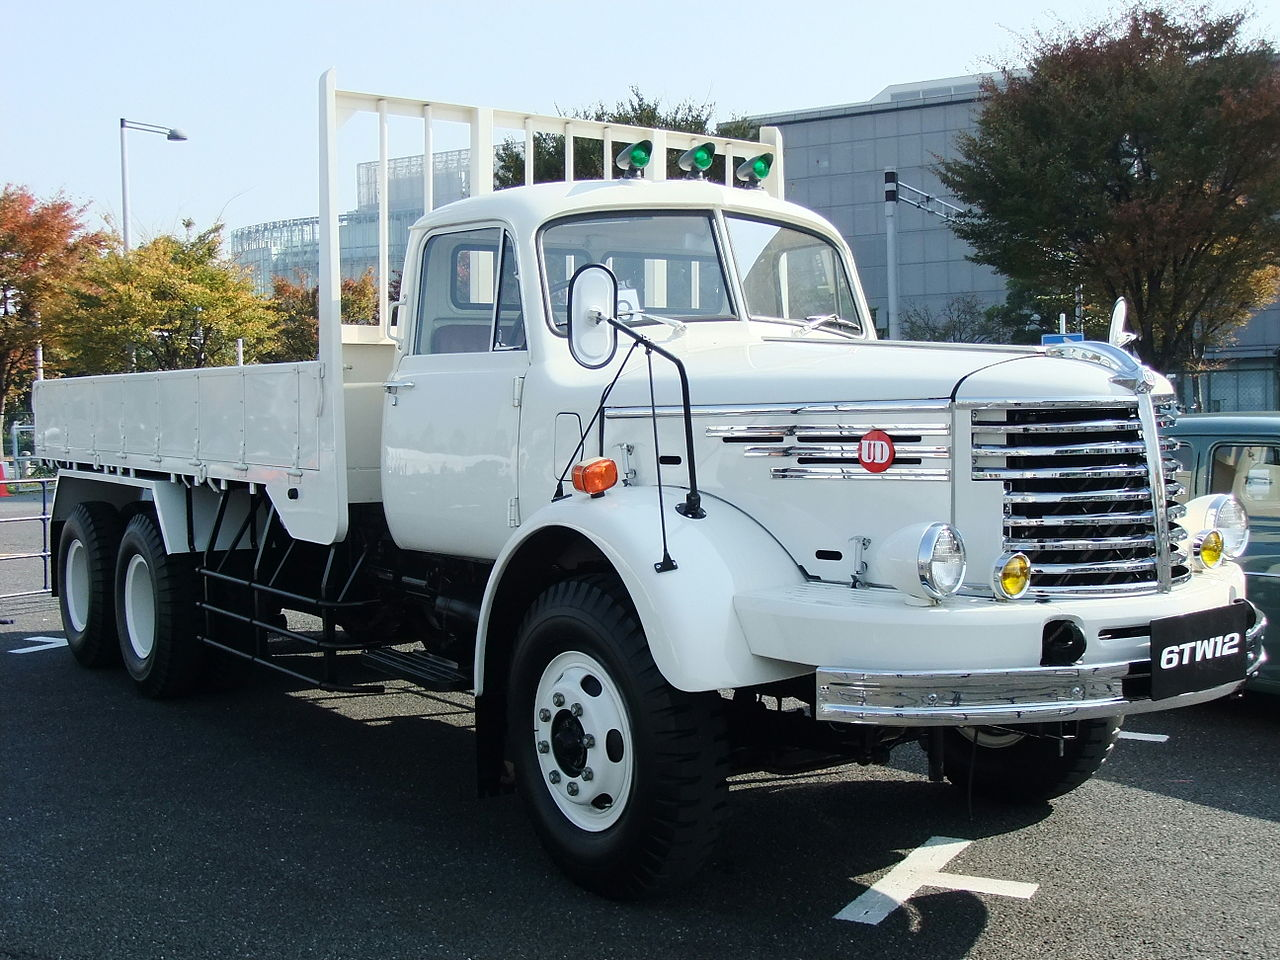 File:Nissan Diesel, 6TW12, White Truck.jpg - Wikimedia Commons